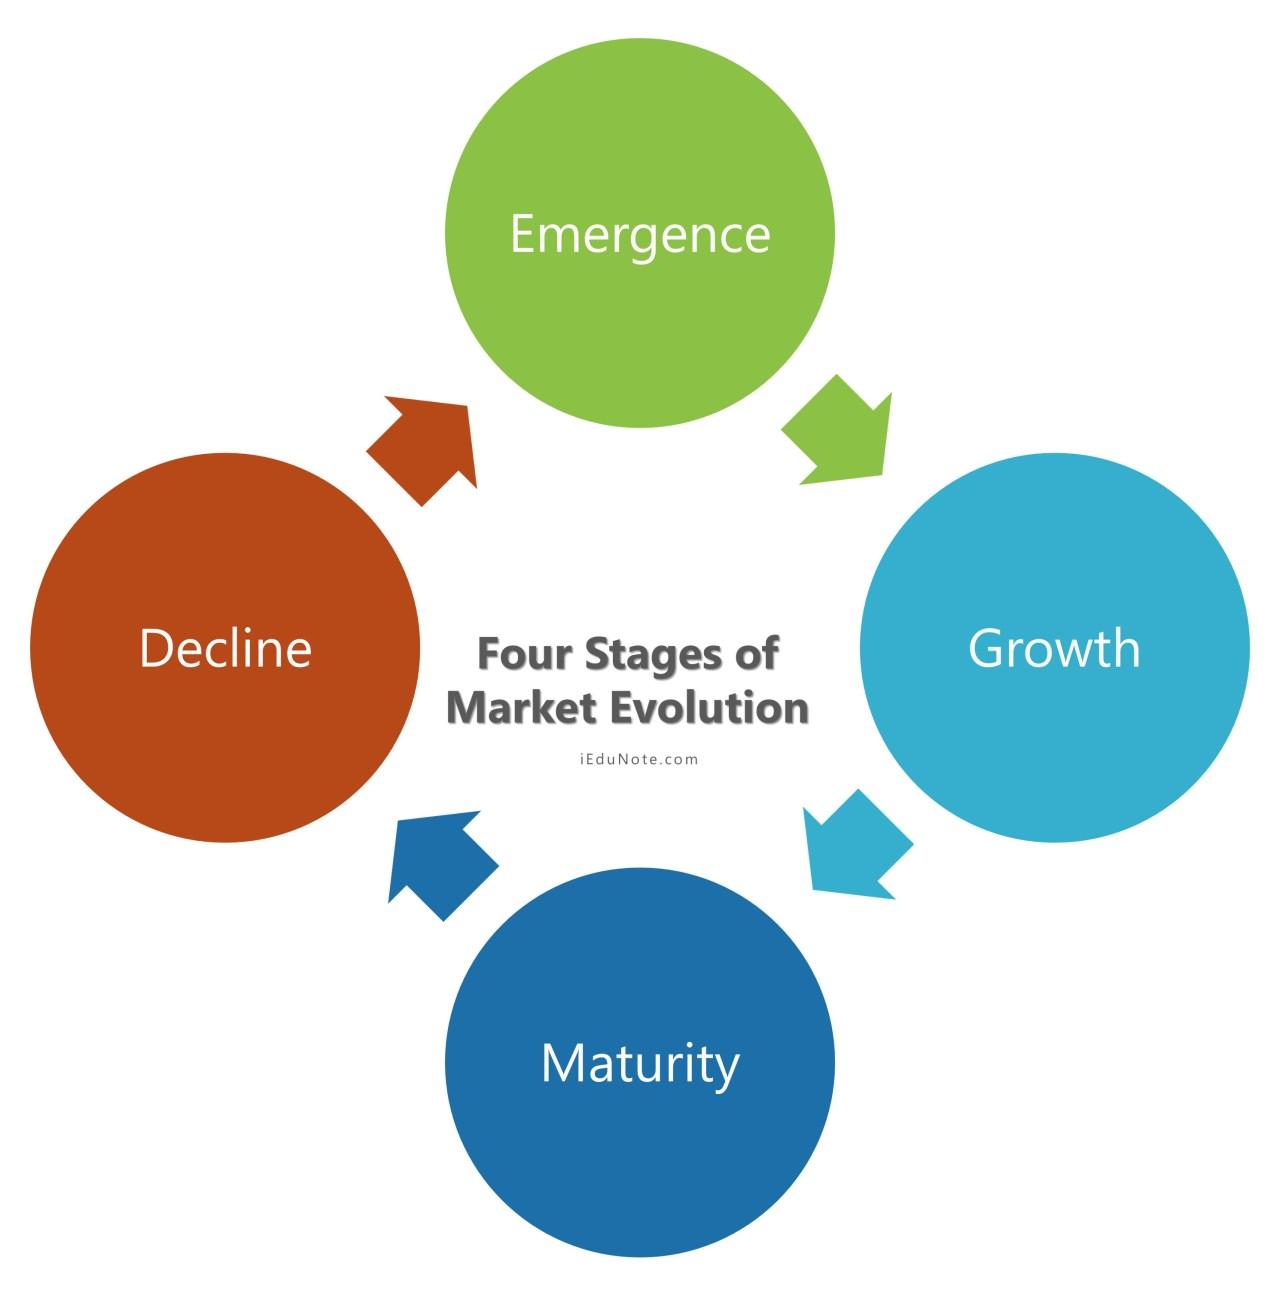 Four stages of Market Evolution